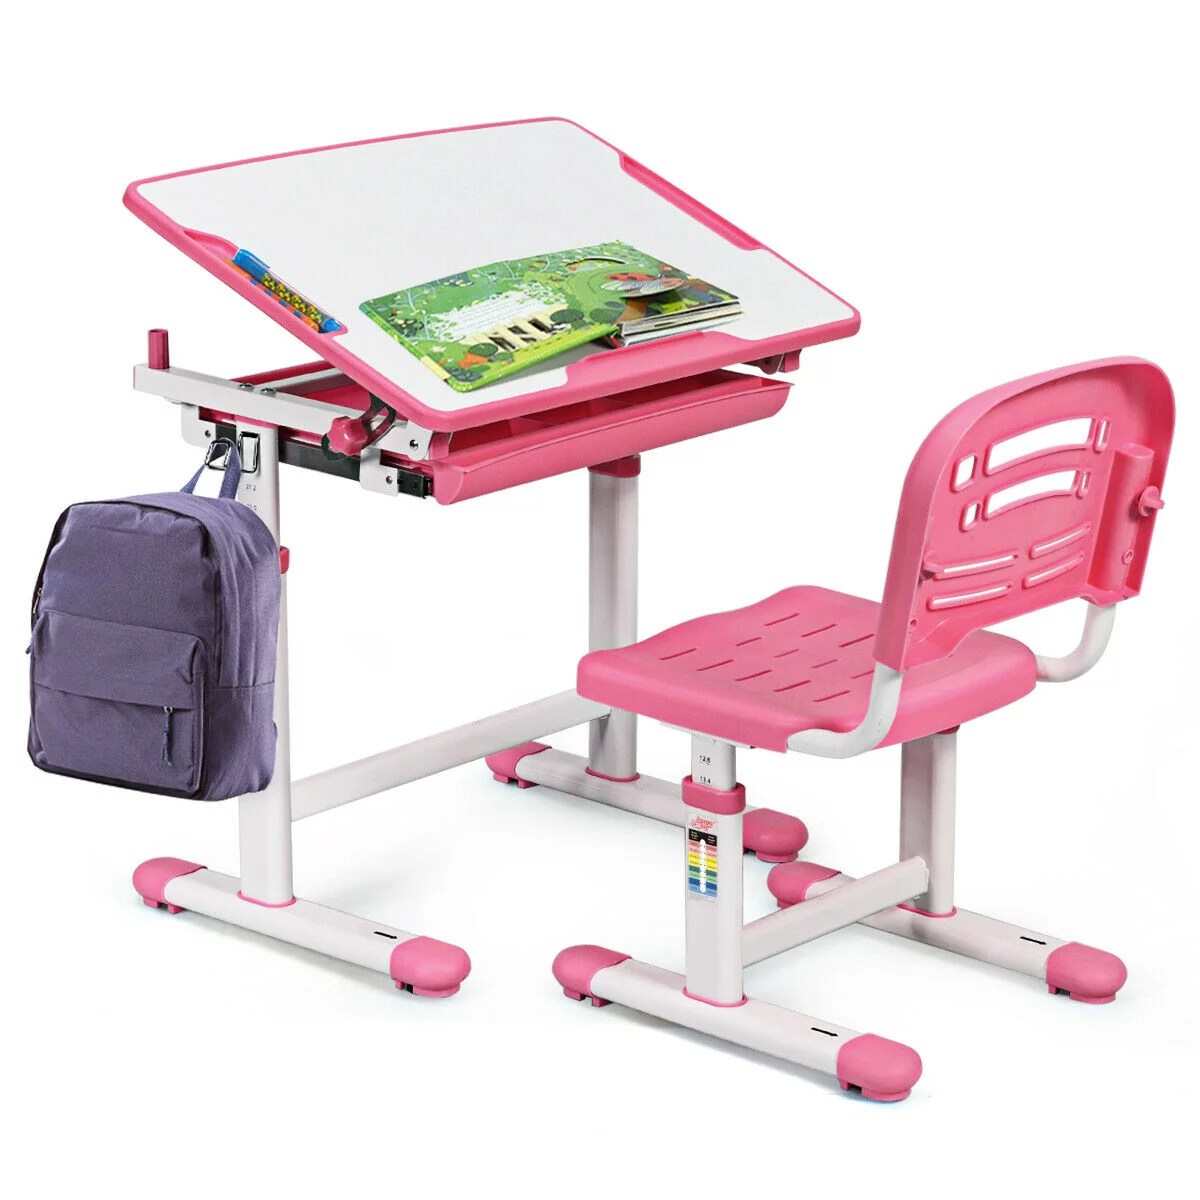 Gymax Height Adjustable Children S Desk Chair Set Multifunctional Study Drawing Pink Walmart Com Walmart Com